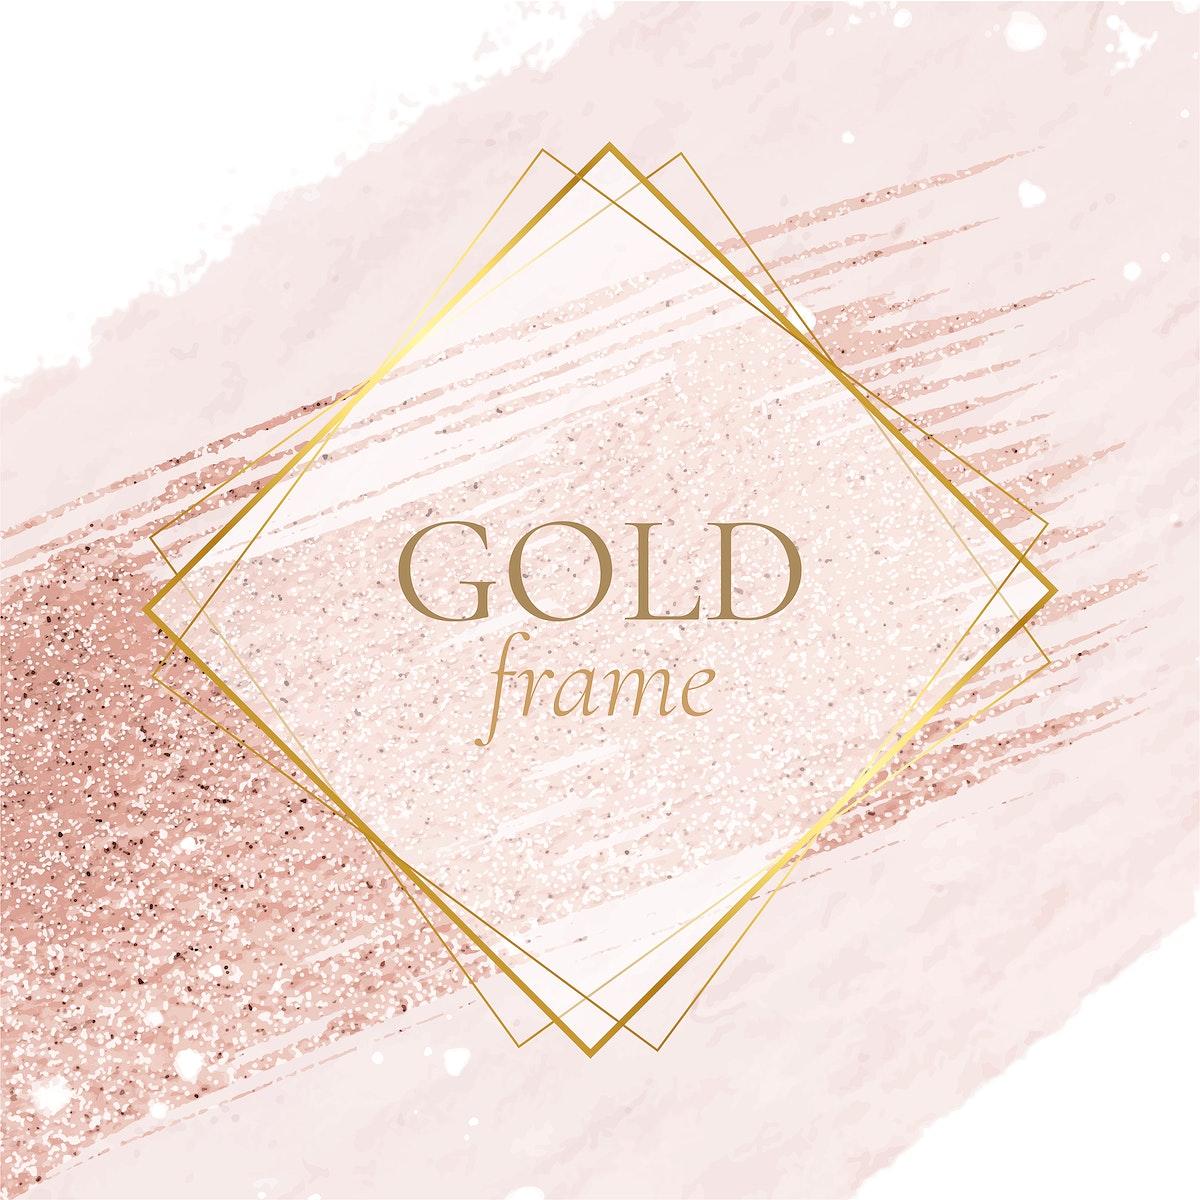 rhombus frame, gold square frames, badge, banner